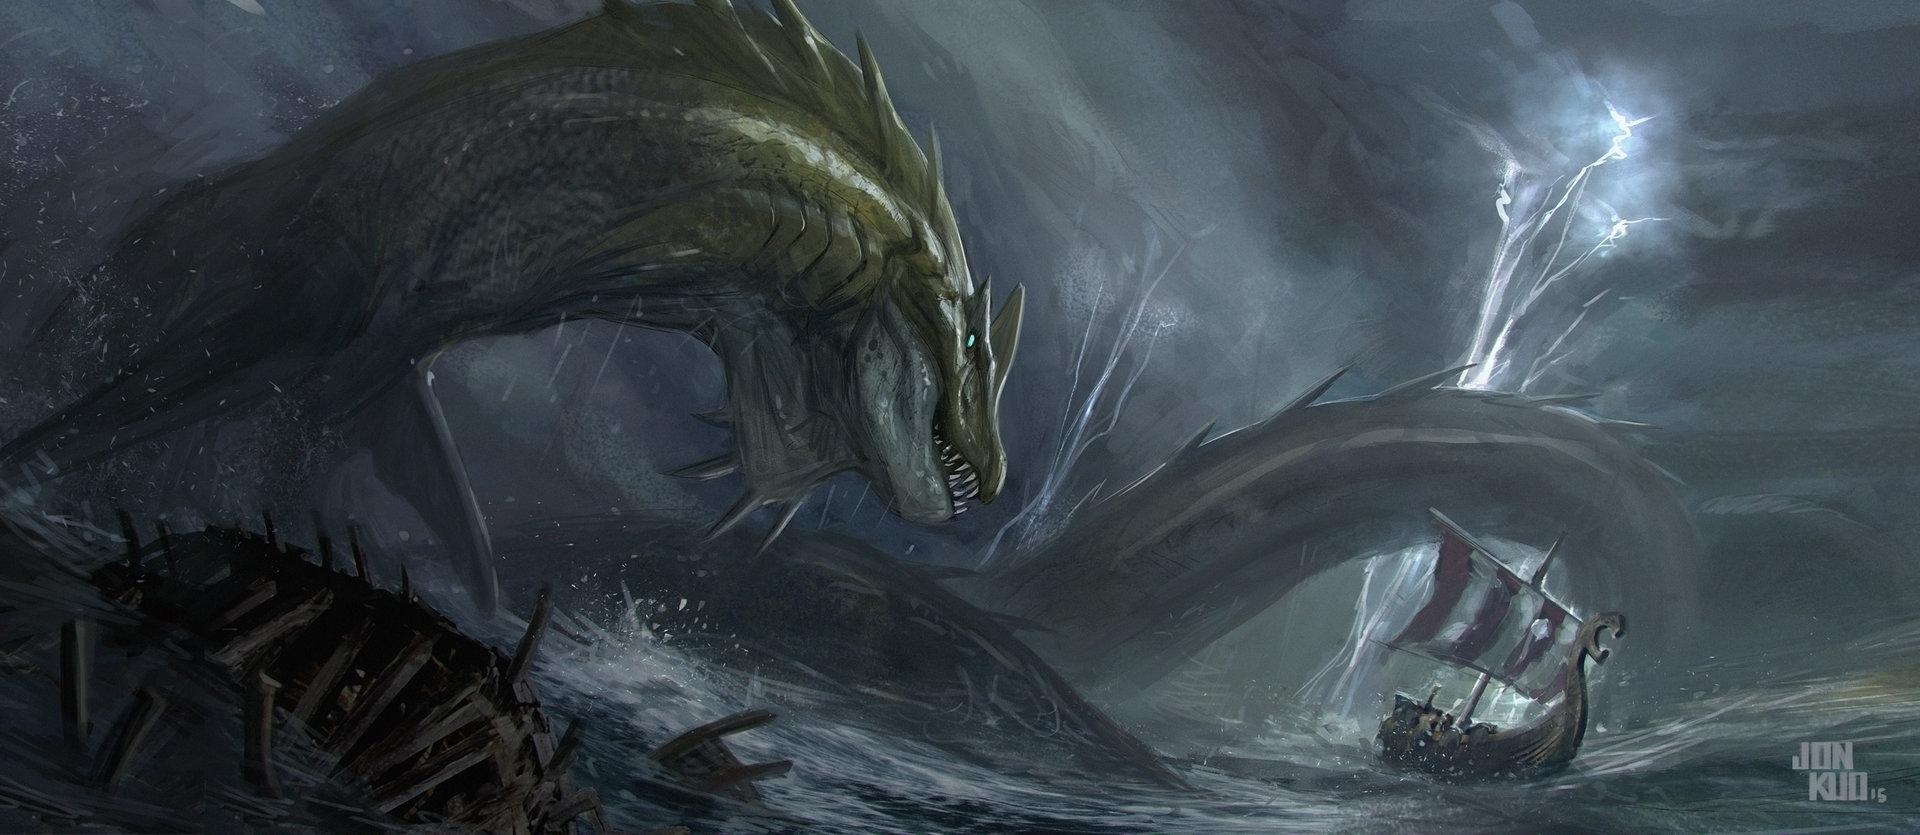 Giant sea monsters art - photo#29